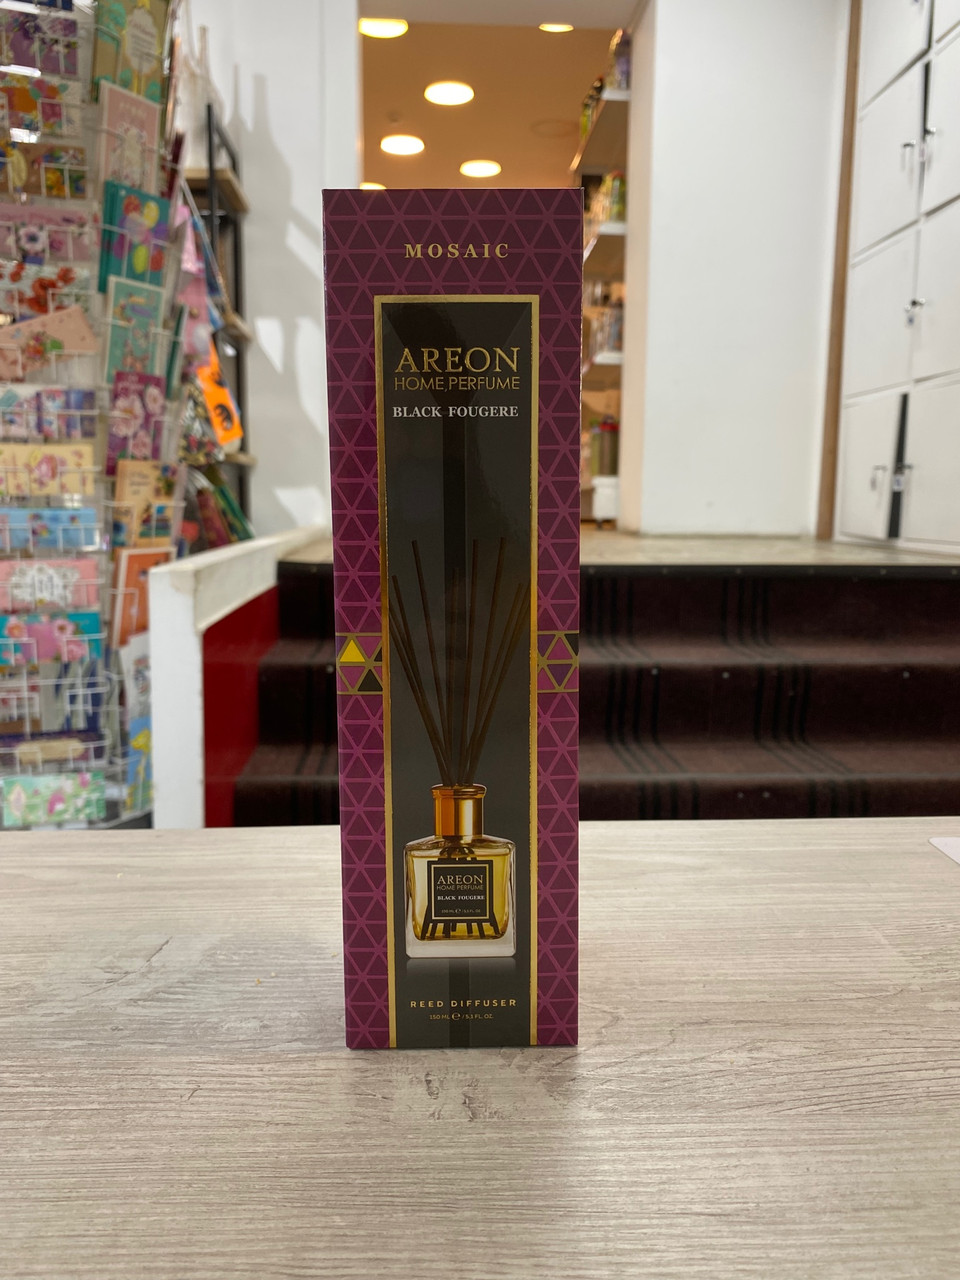 Areon ароматизатор для дома серия Mosaic парфюмированная 150 мл Black Fougere